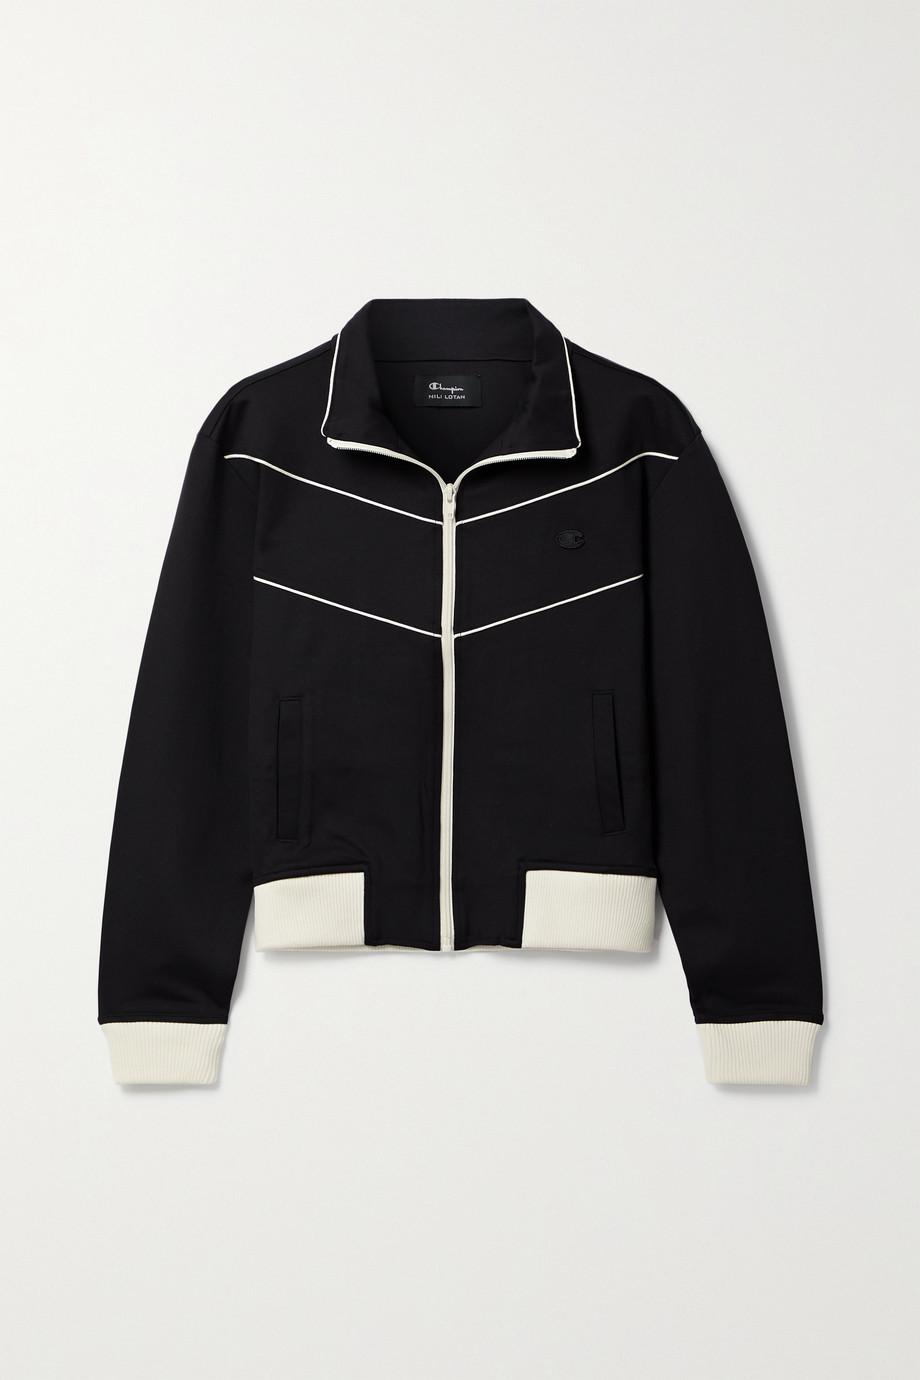 Nili Lotan + Champion Trainingsjacke aus Stretch-Jersey mit Applikation